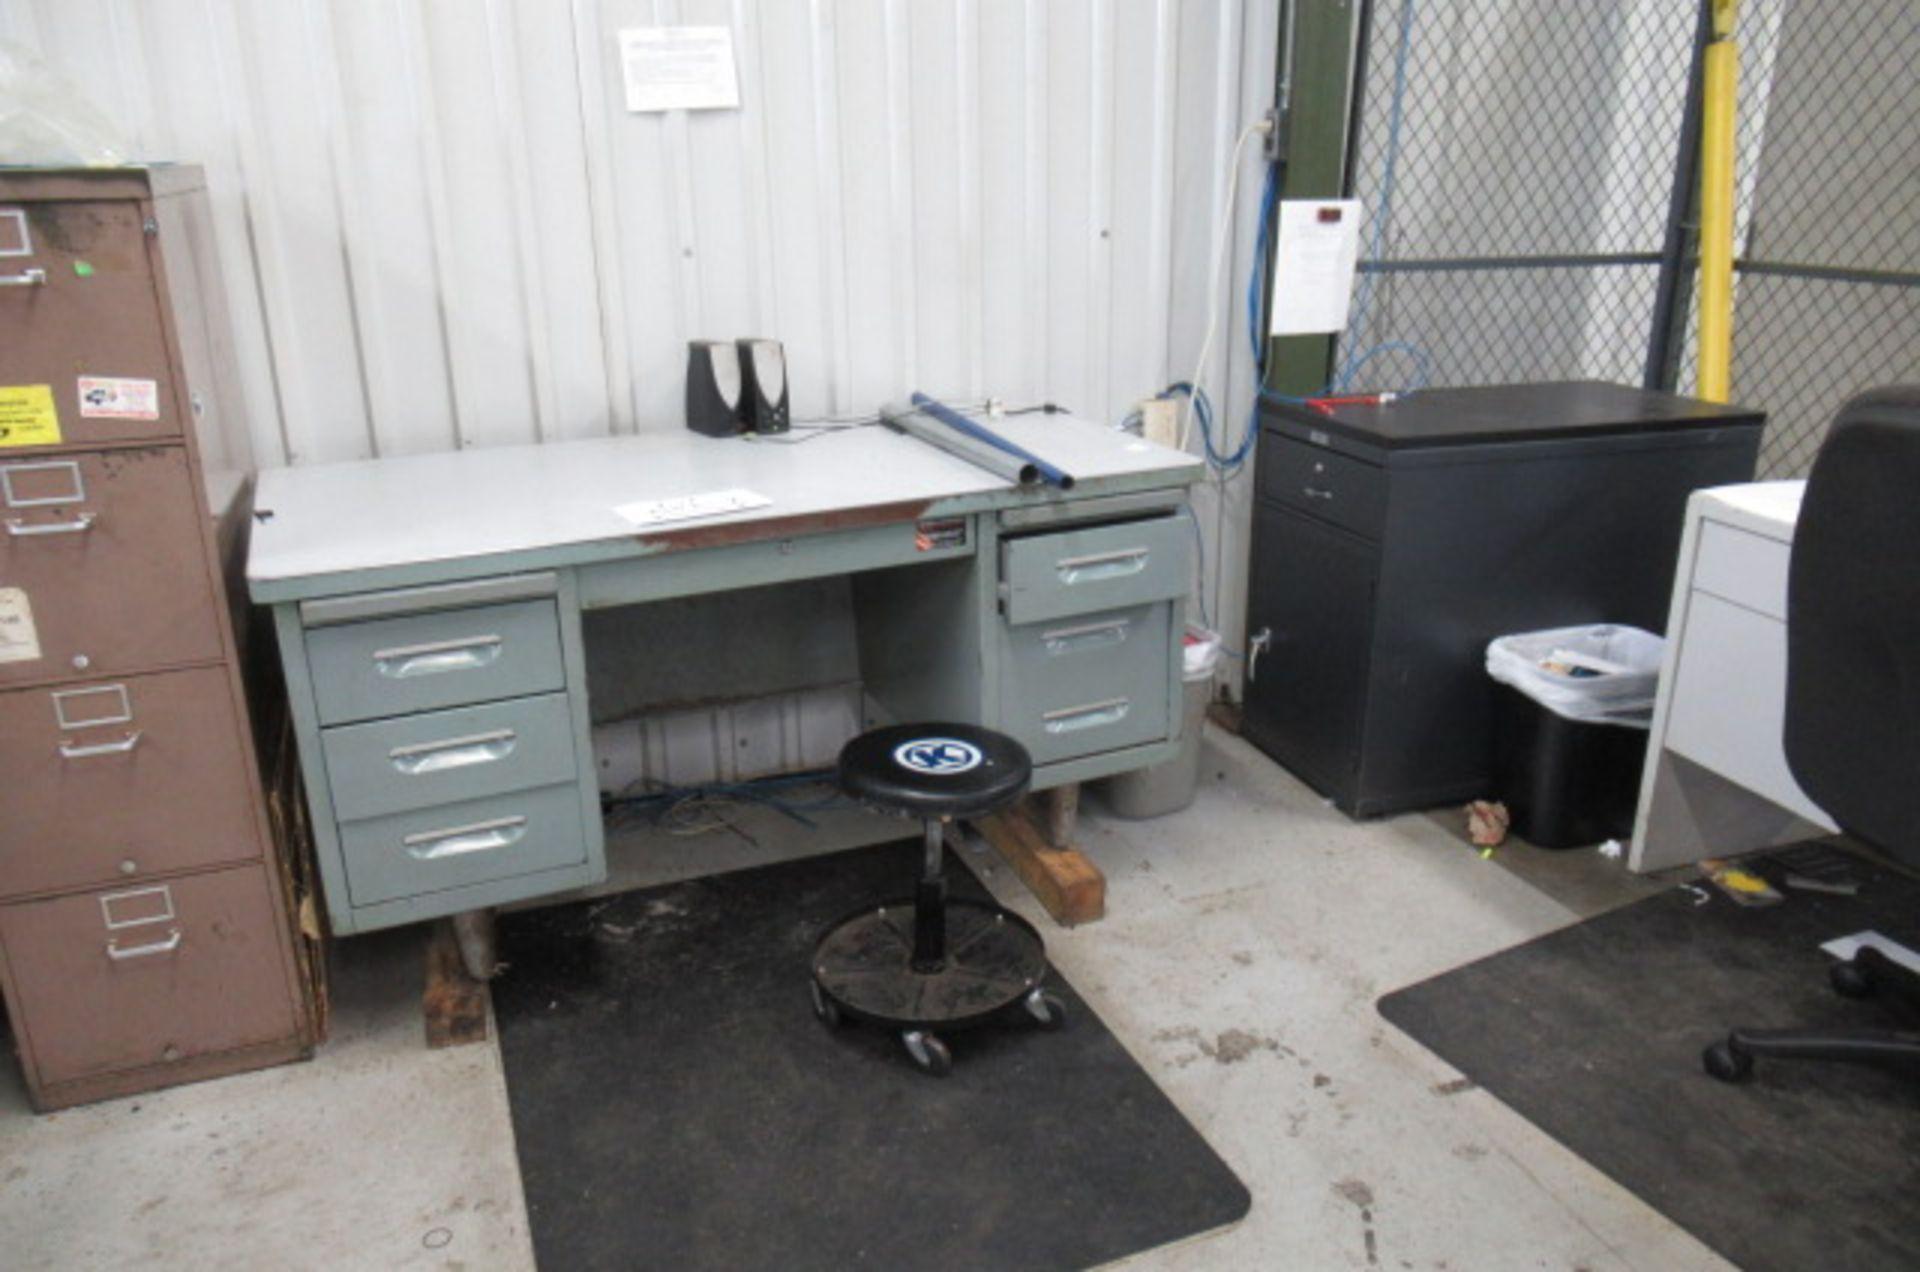 parts cage area 6 desks, 3 file cabinets, 2 Dell monitors, 3 key boards - Image 4 of 4